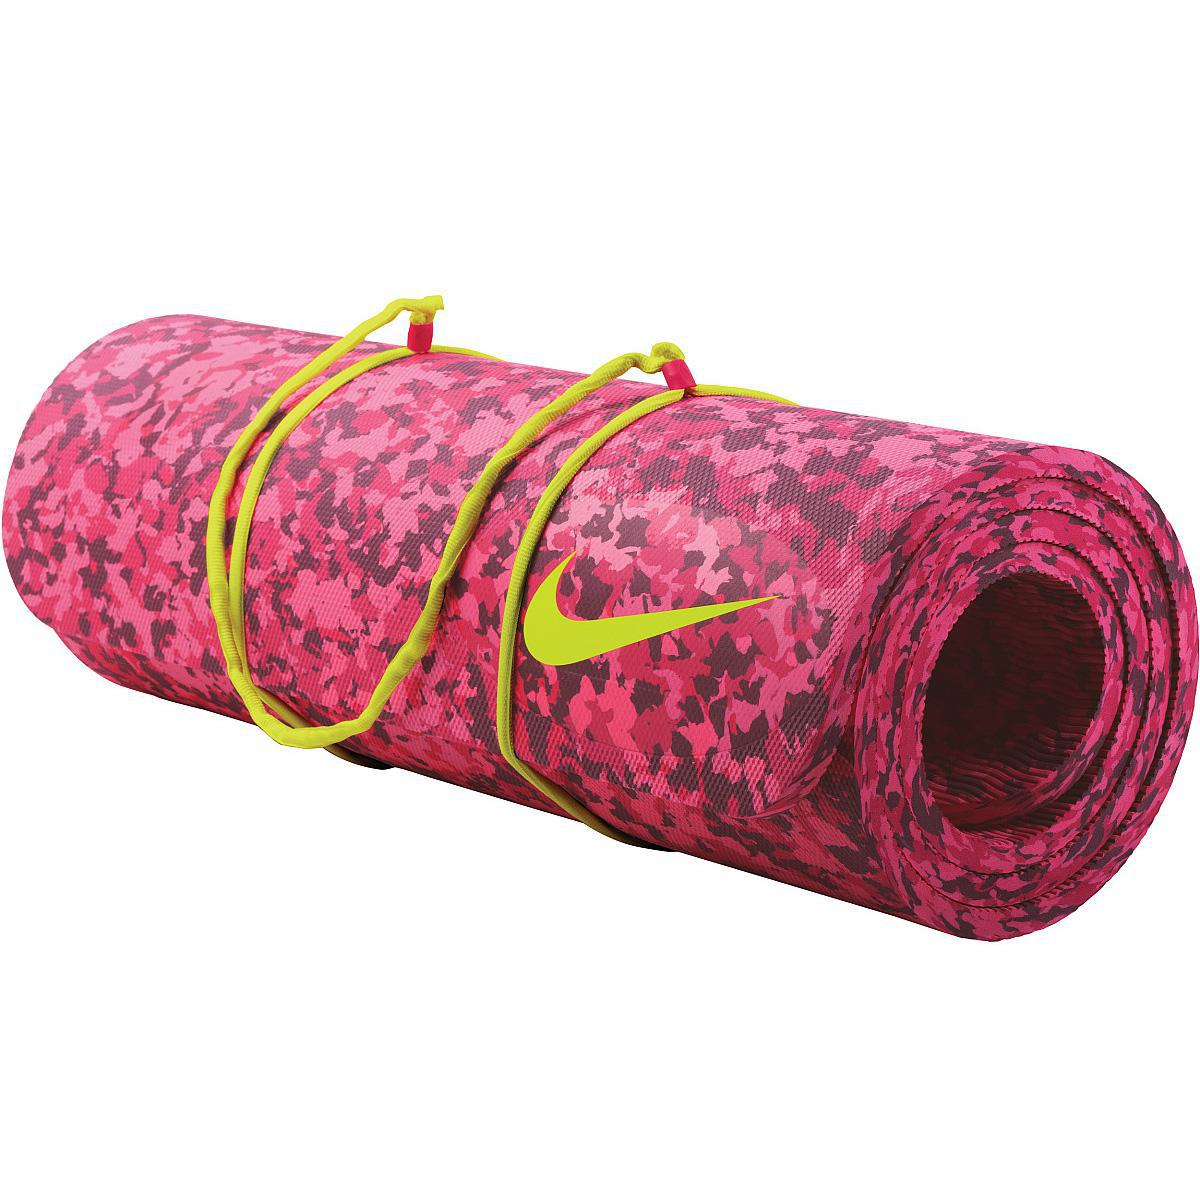 Hyper Pink/Fuchsia Force